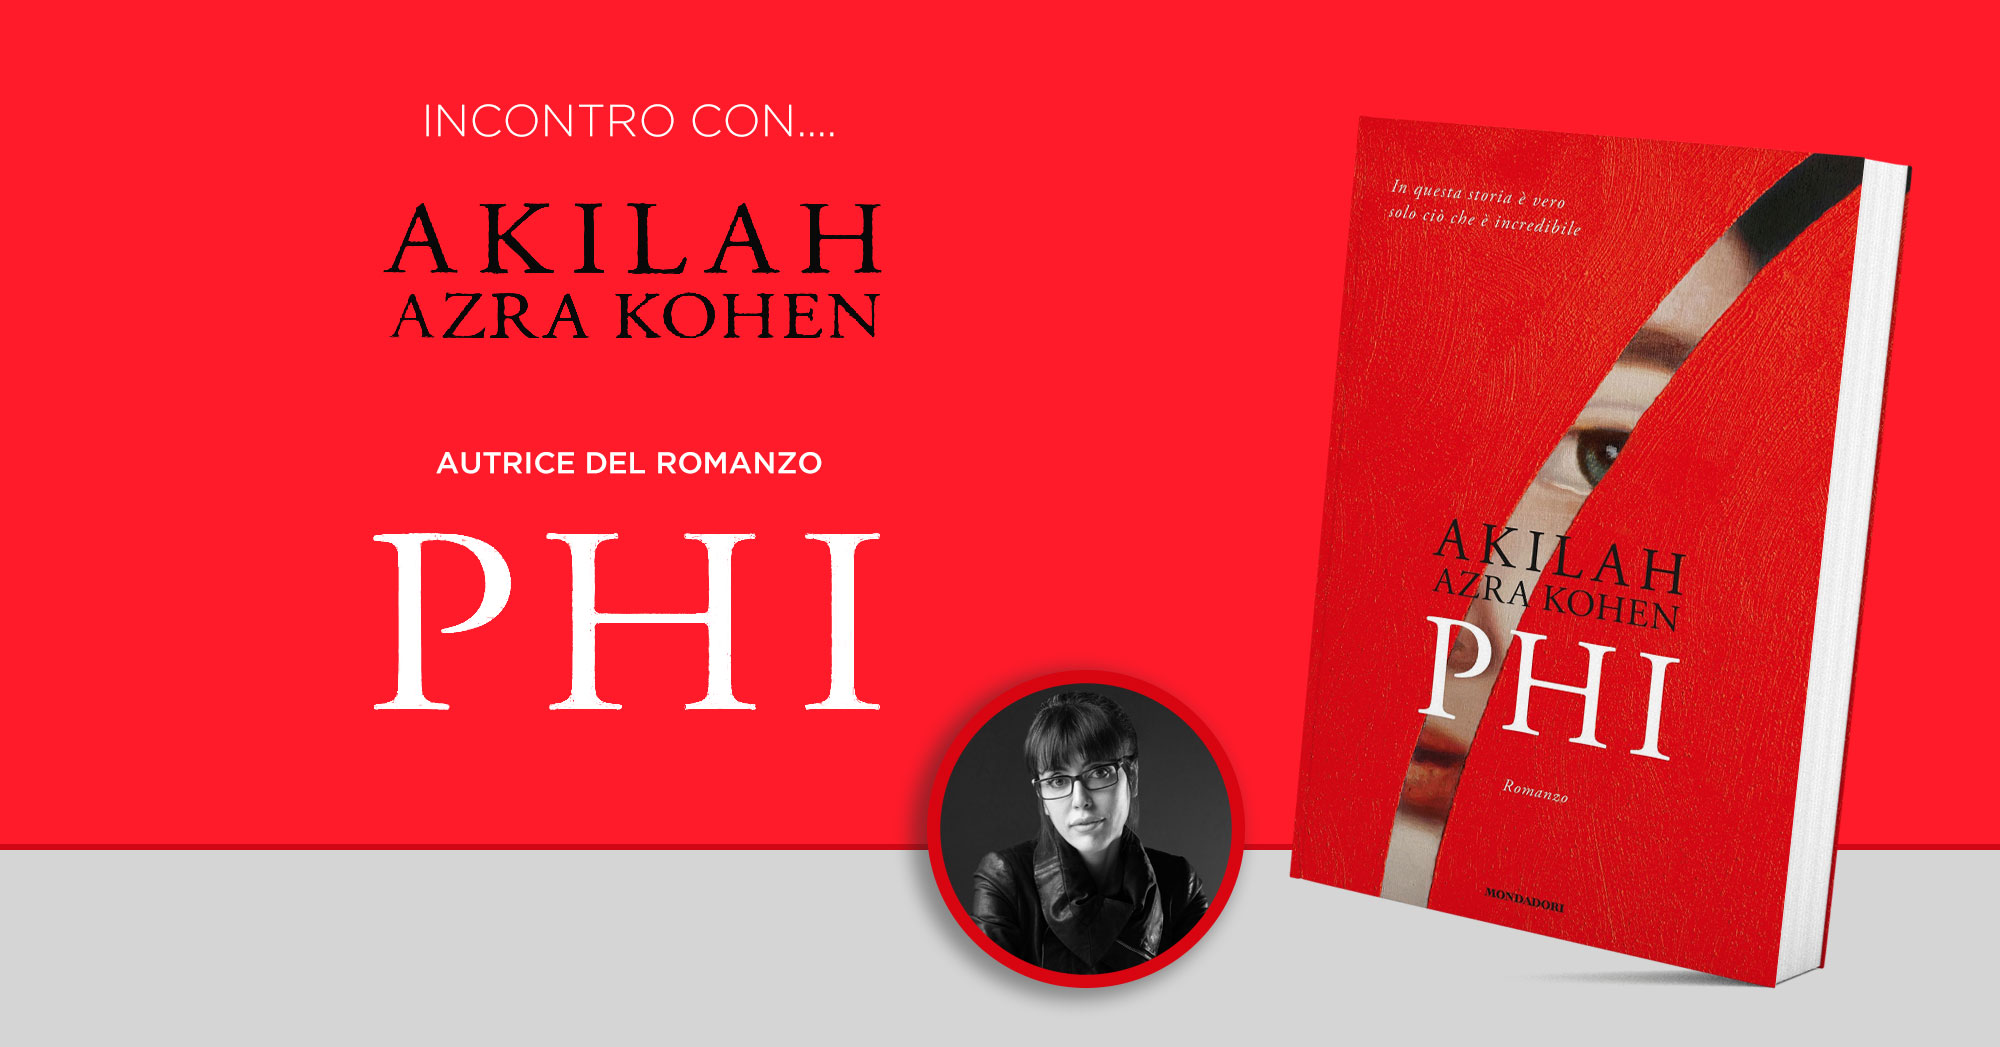 Incontro con Azra Kohen